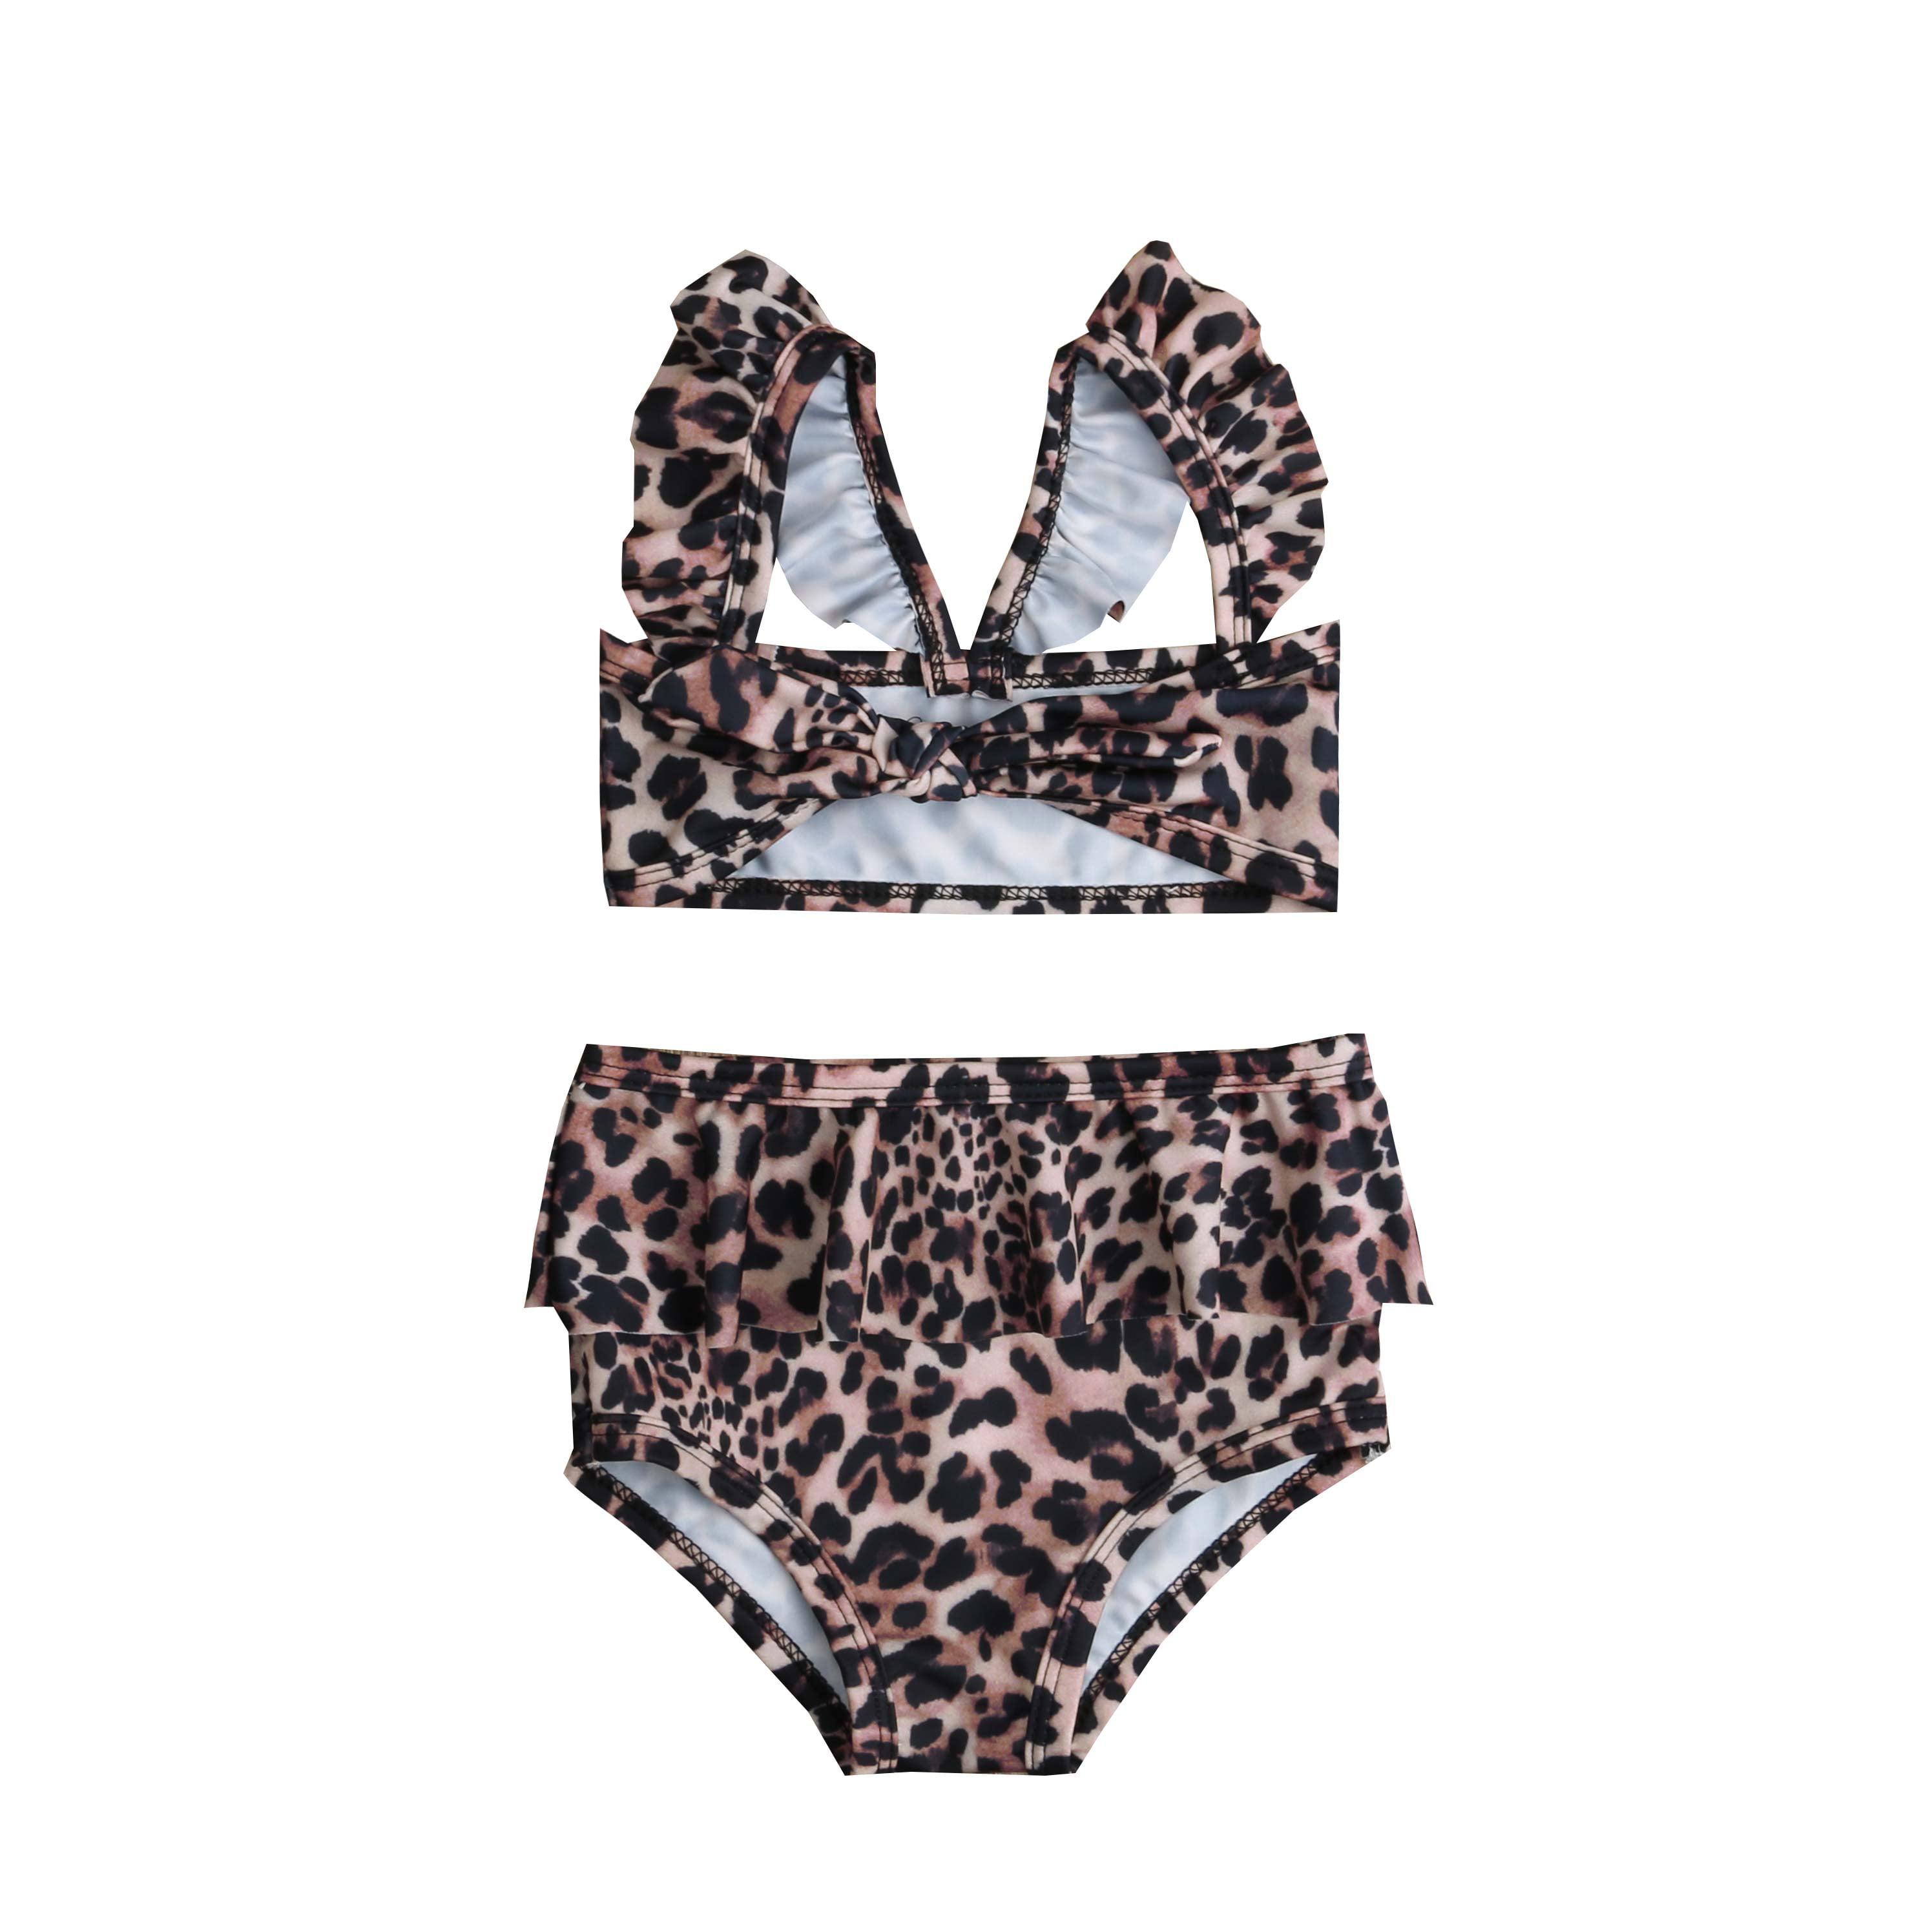 Toddler Kids Girls Leopard Print 2Pcs Bikini Set Children Swimsuit Beachwear